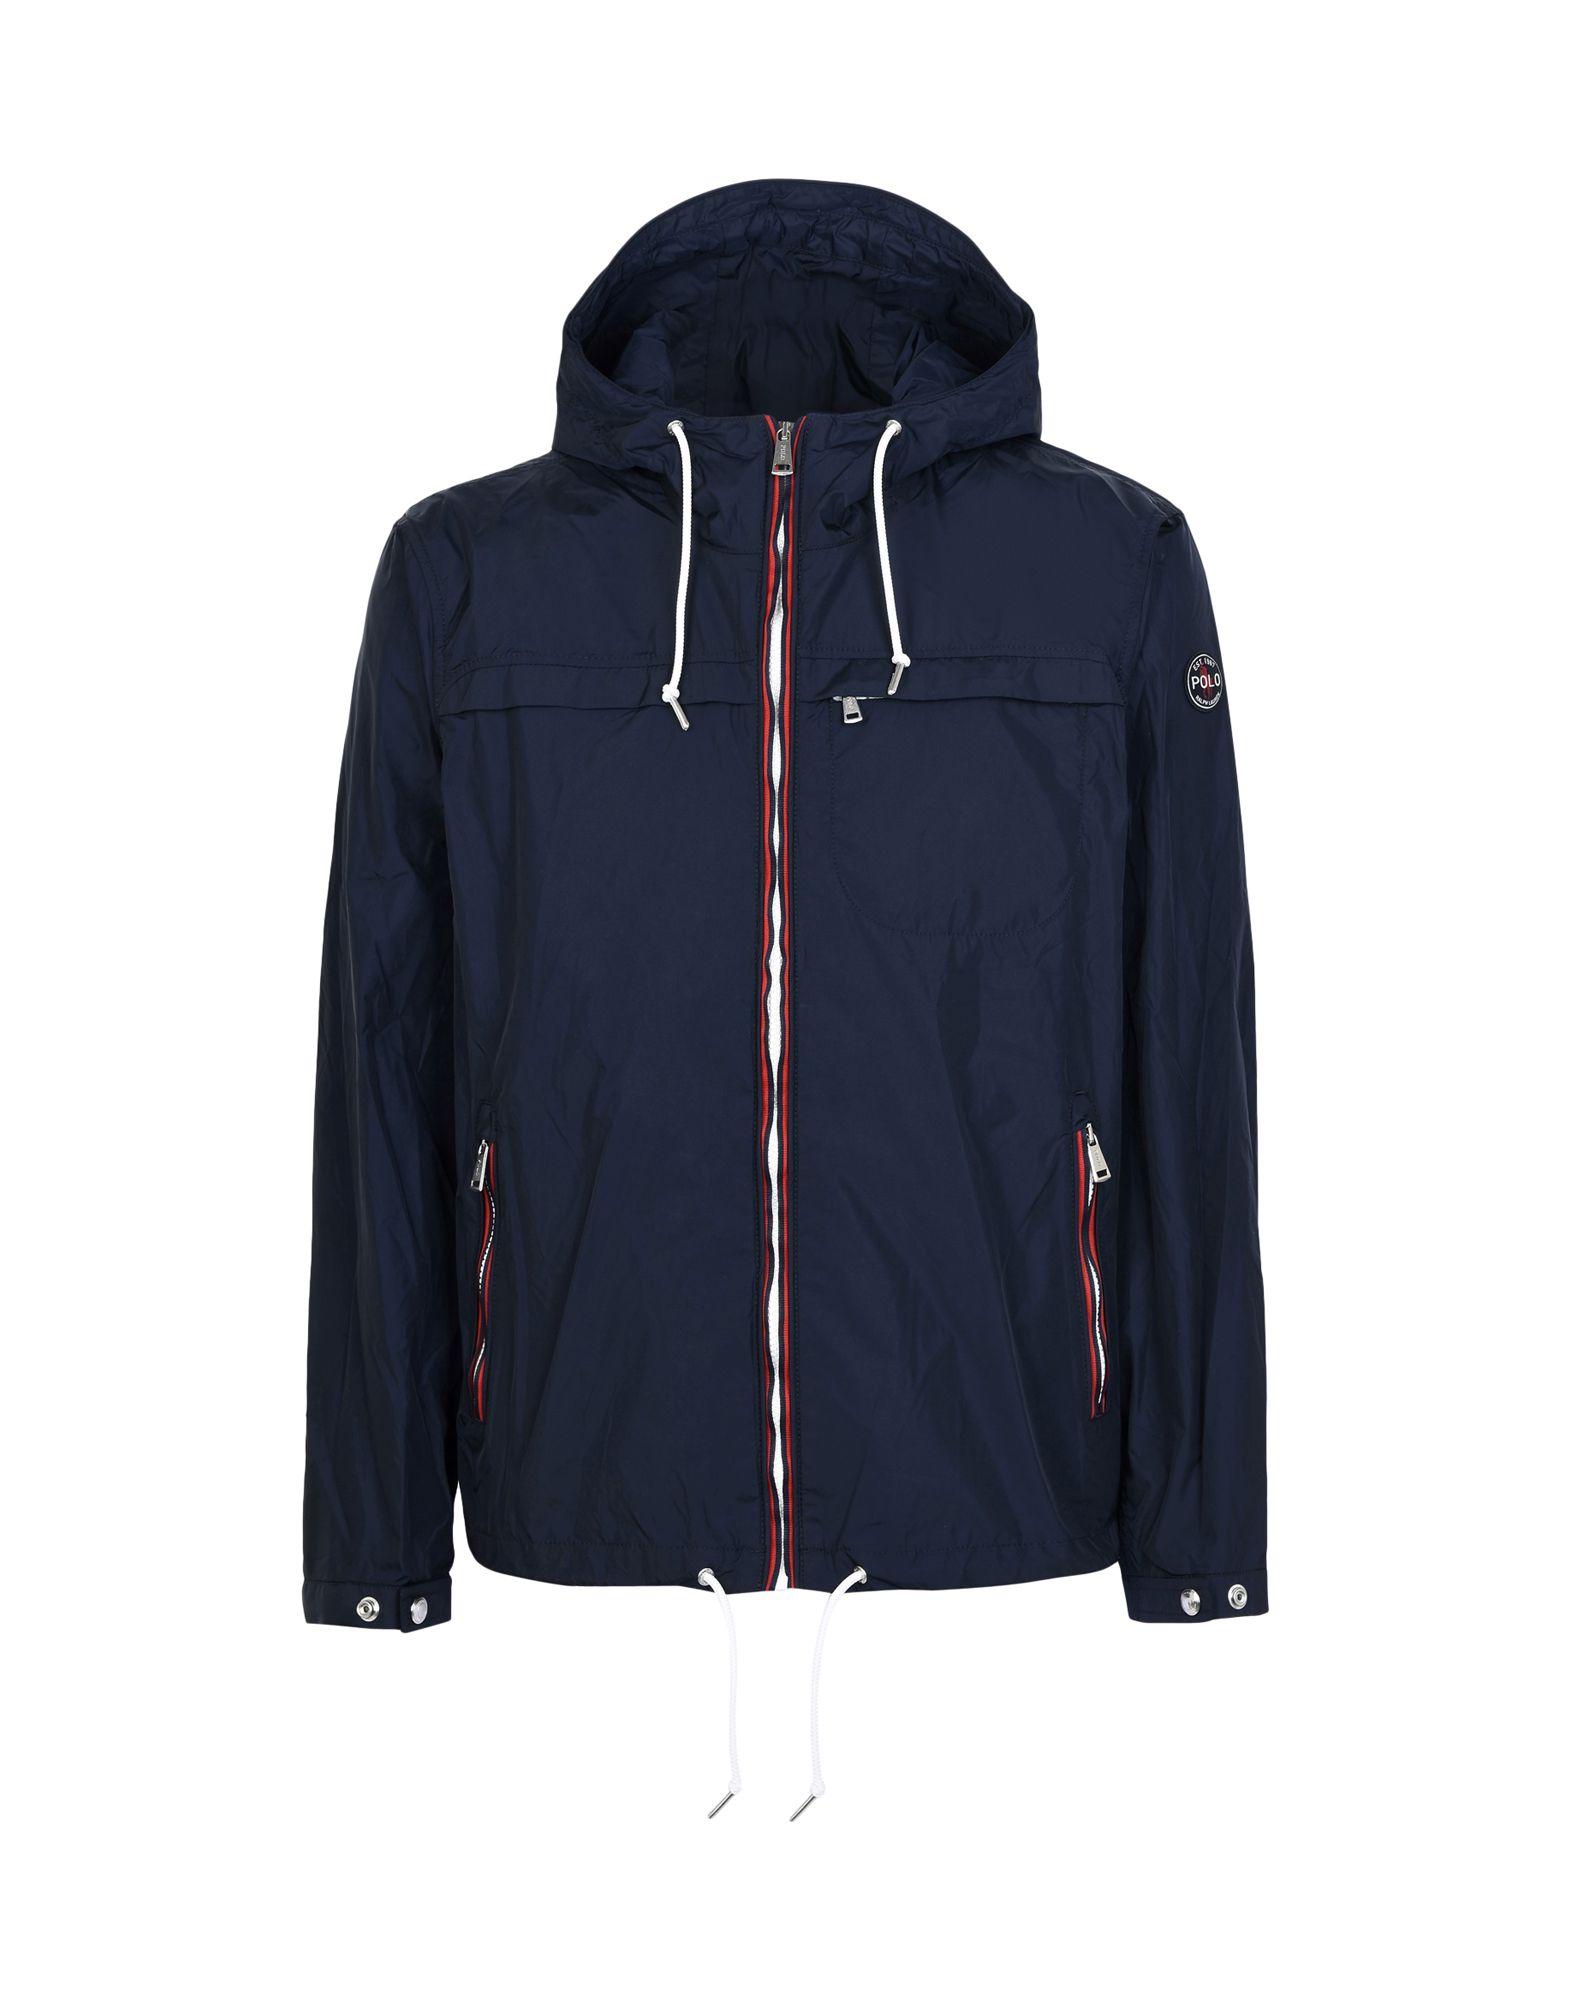 Giubbotto Polo Ralph Lauren Anorak Jacket - Uomo - Acquista online su YOOX  - 41783114SE